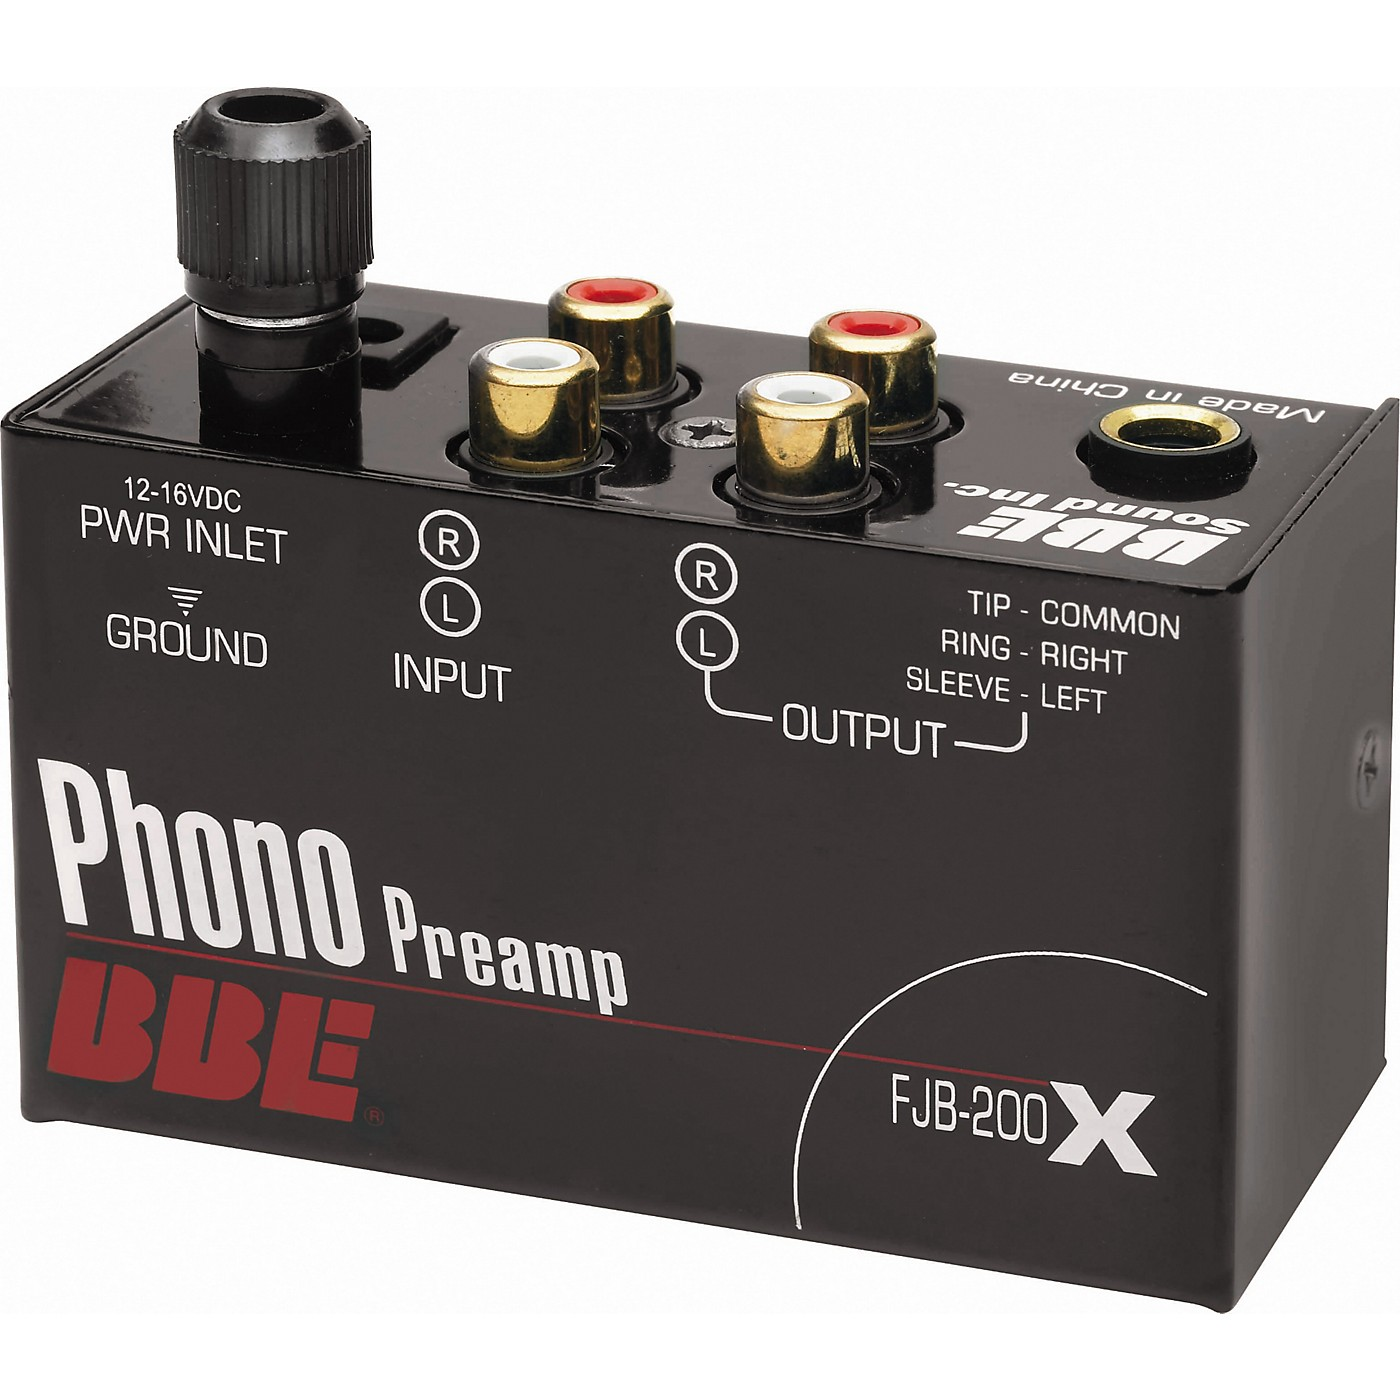 BBE FJB-200X Phono Preamp thumbnail